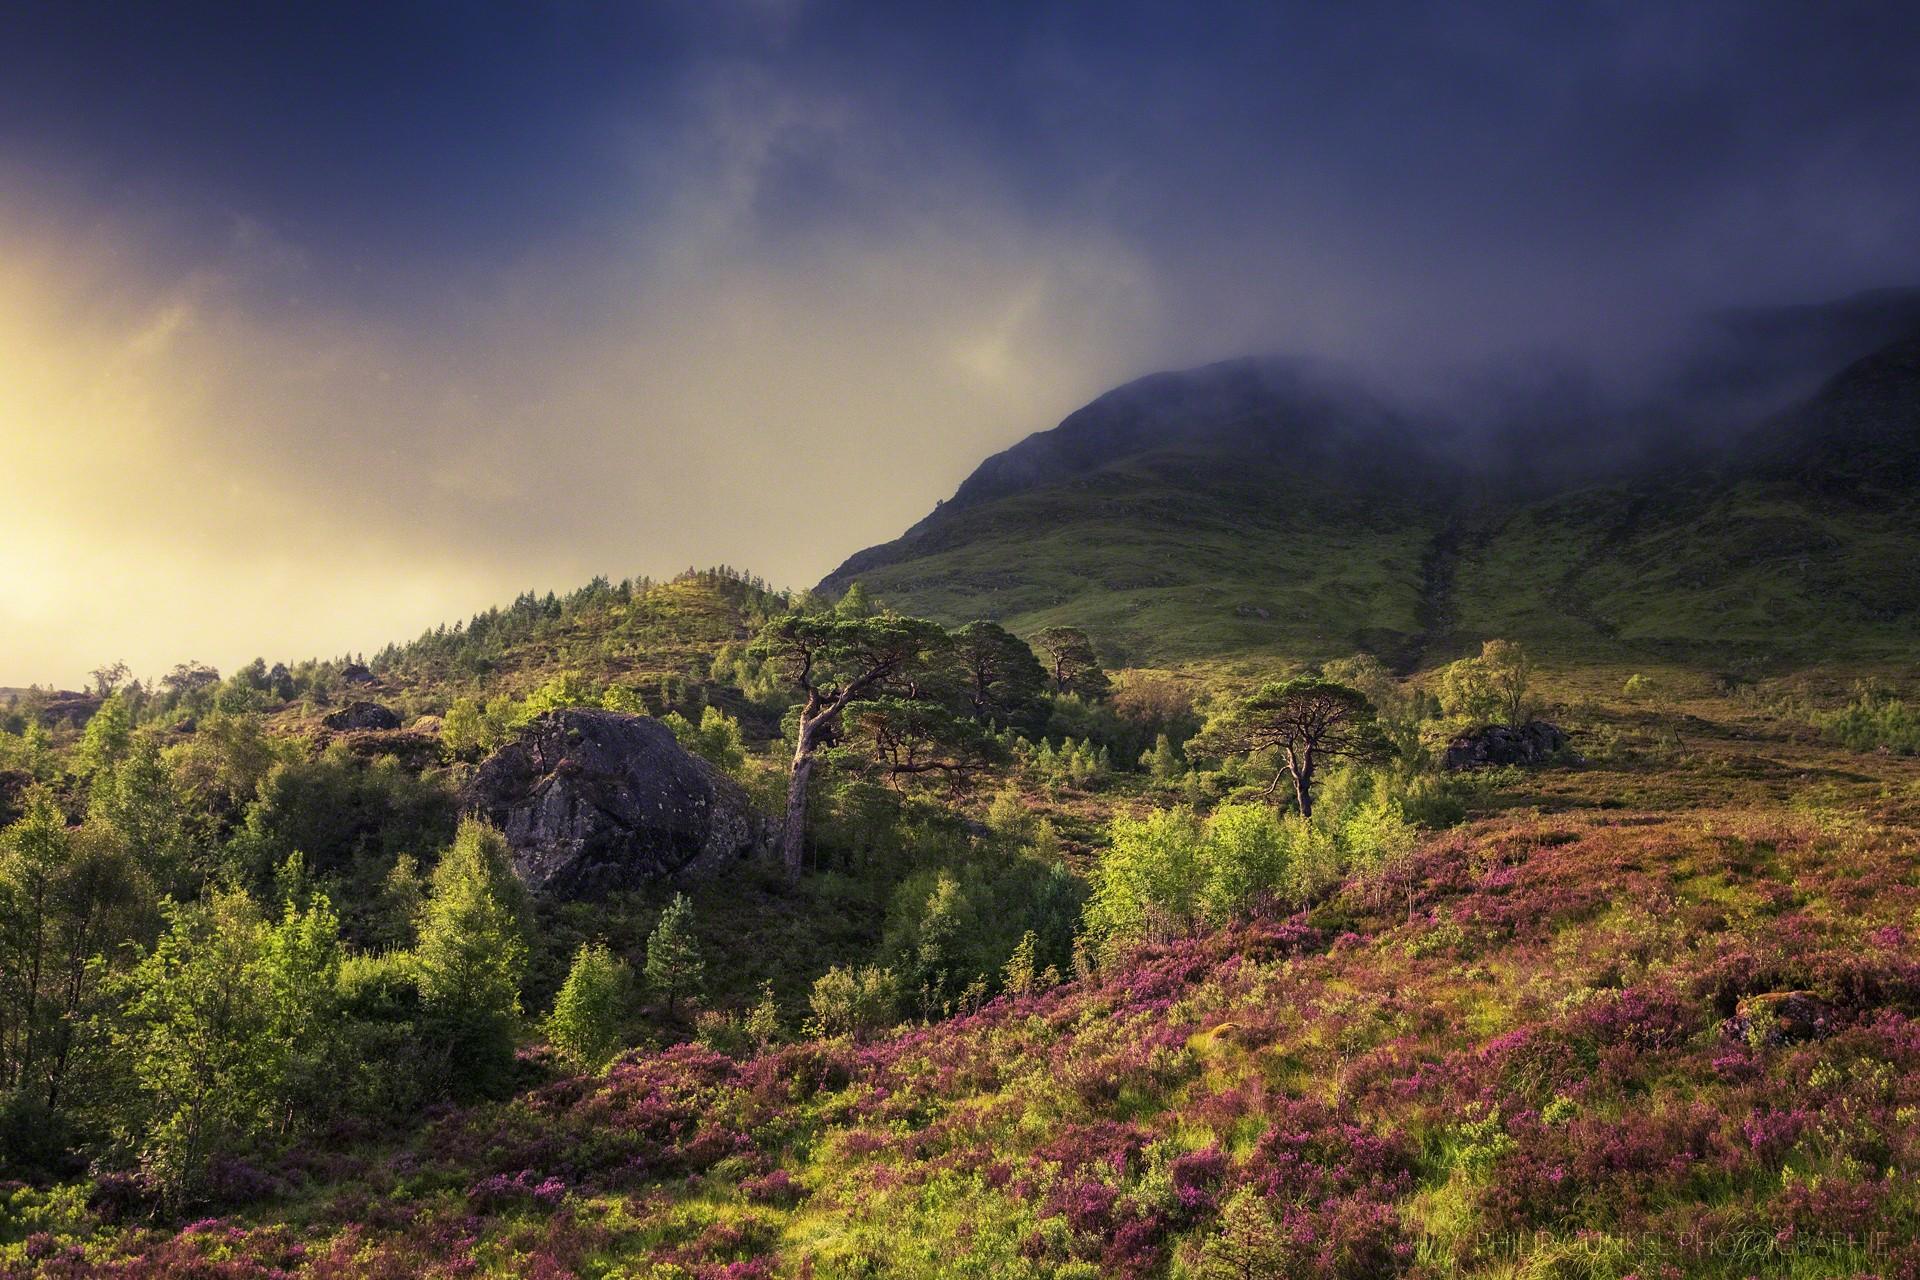 scotland_philip_gunkel_photographie_www.philipgunkel.de24